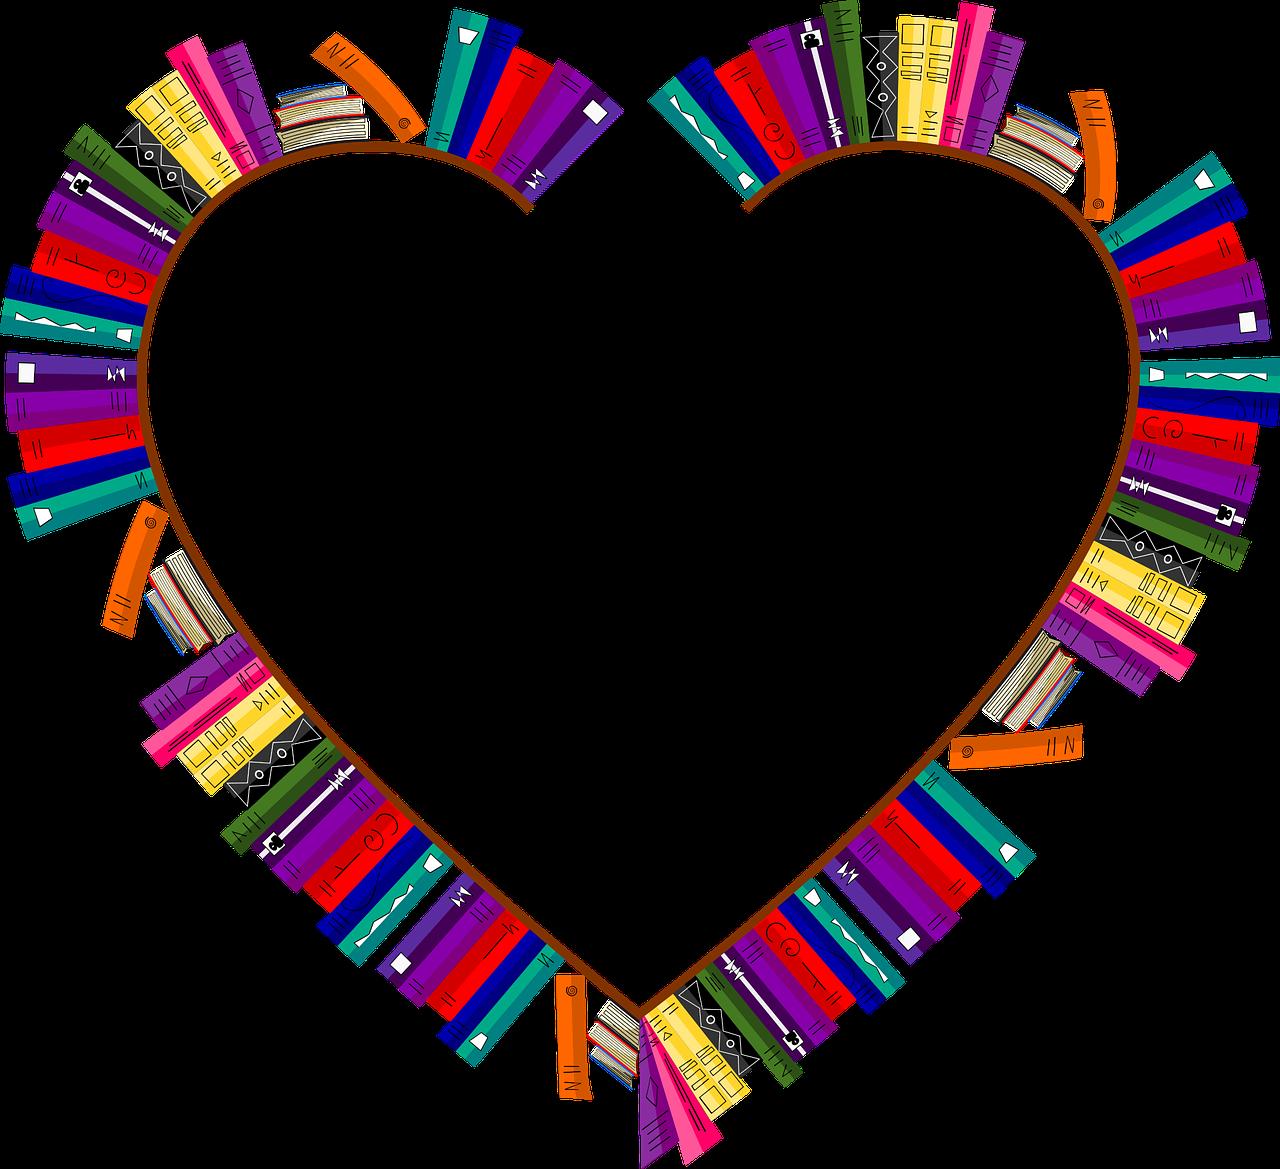 heart-shaped bookshelf